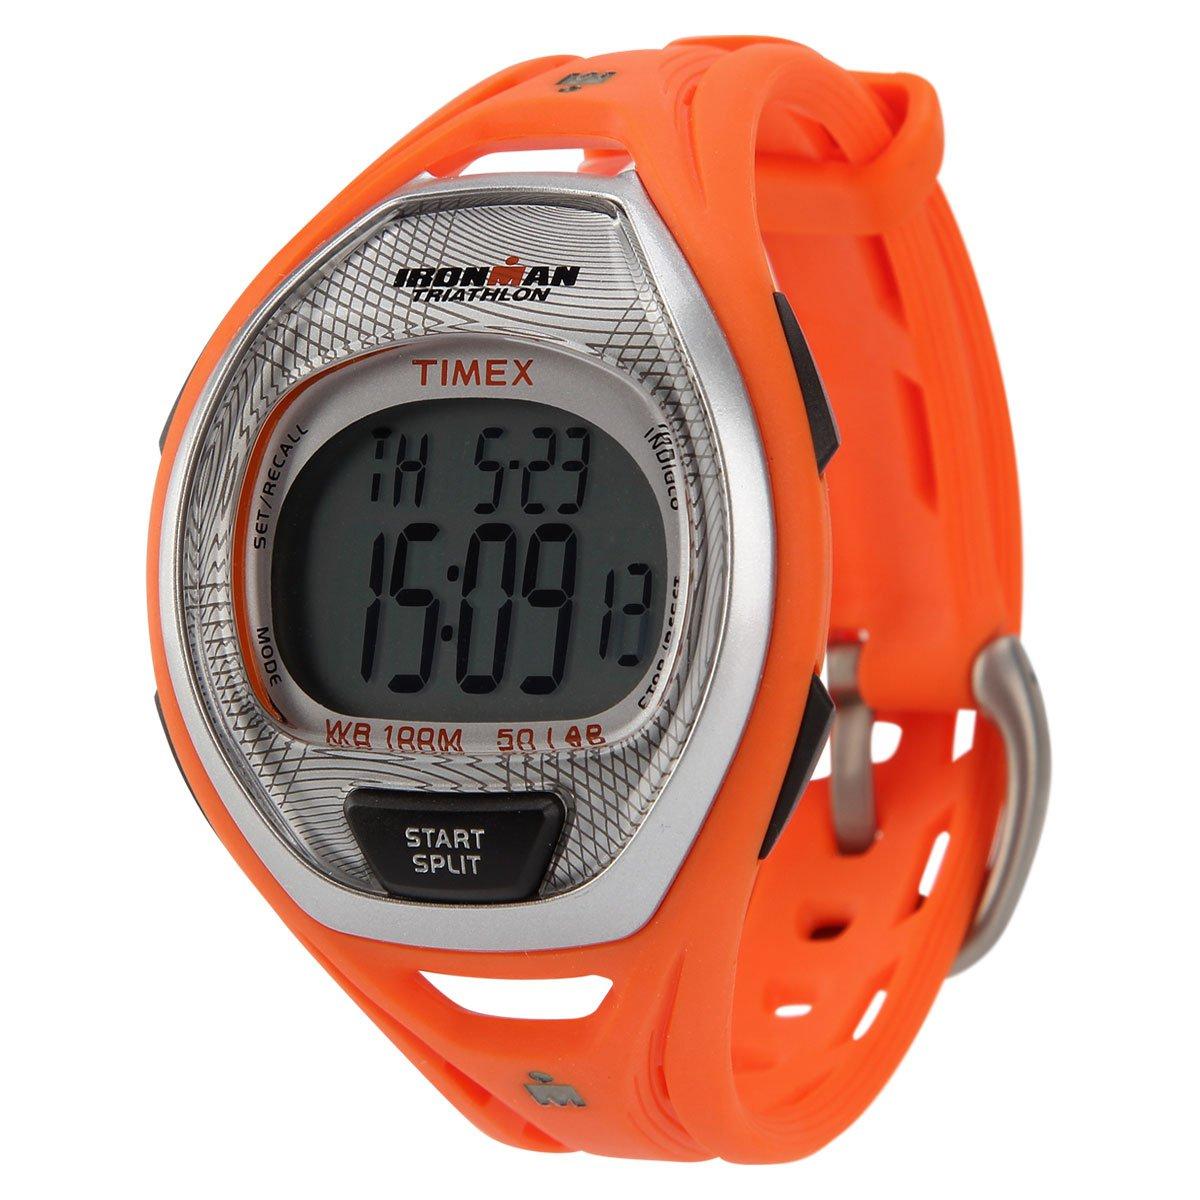 21aaa4def94 Relógio Timex Ironman Sleek 50 Lap T5K512WKL - Compre Agora